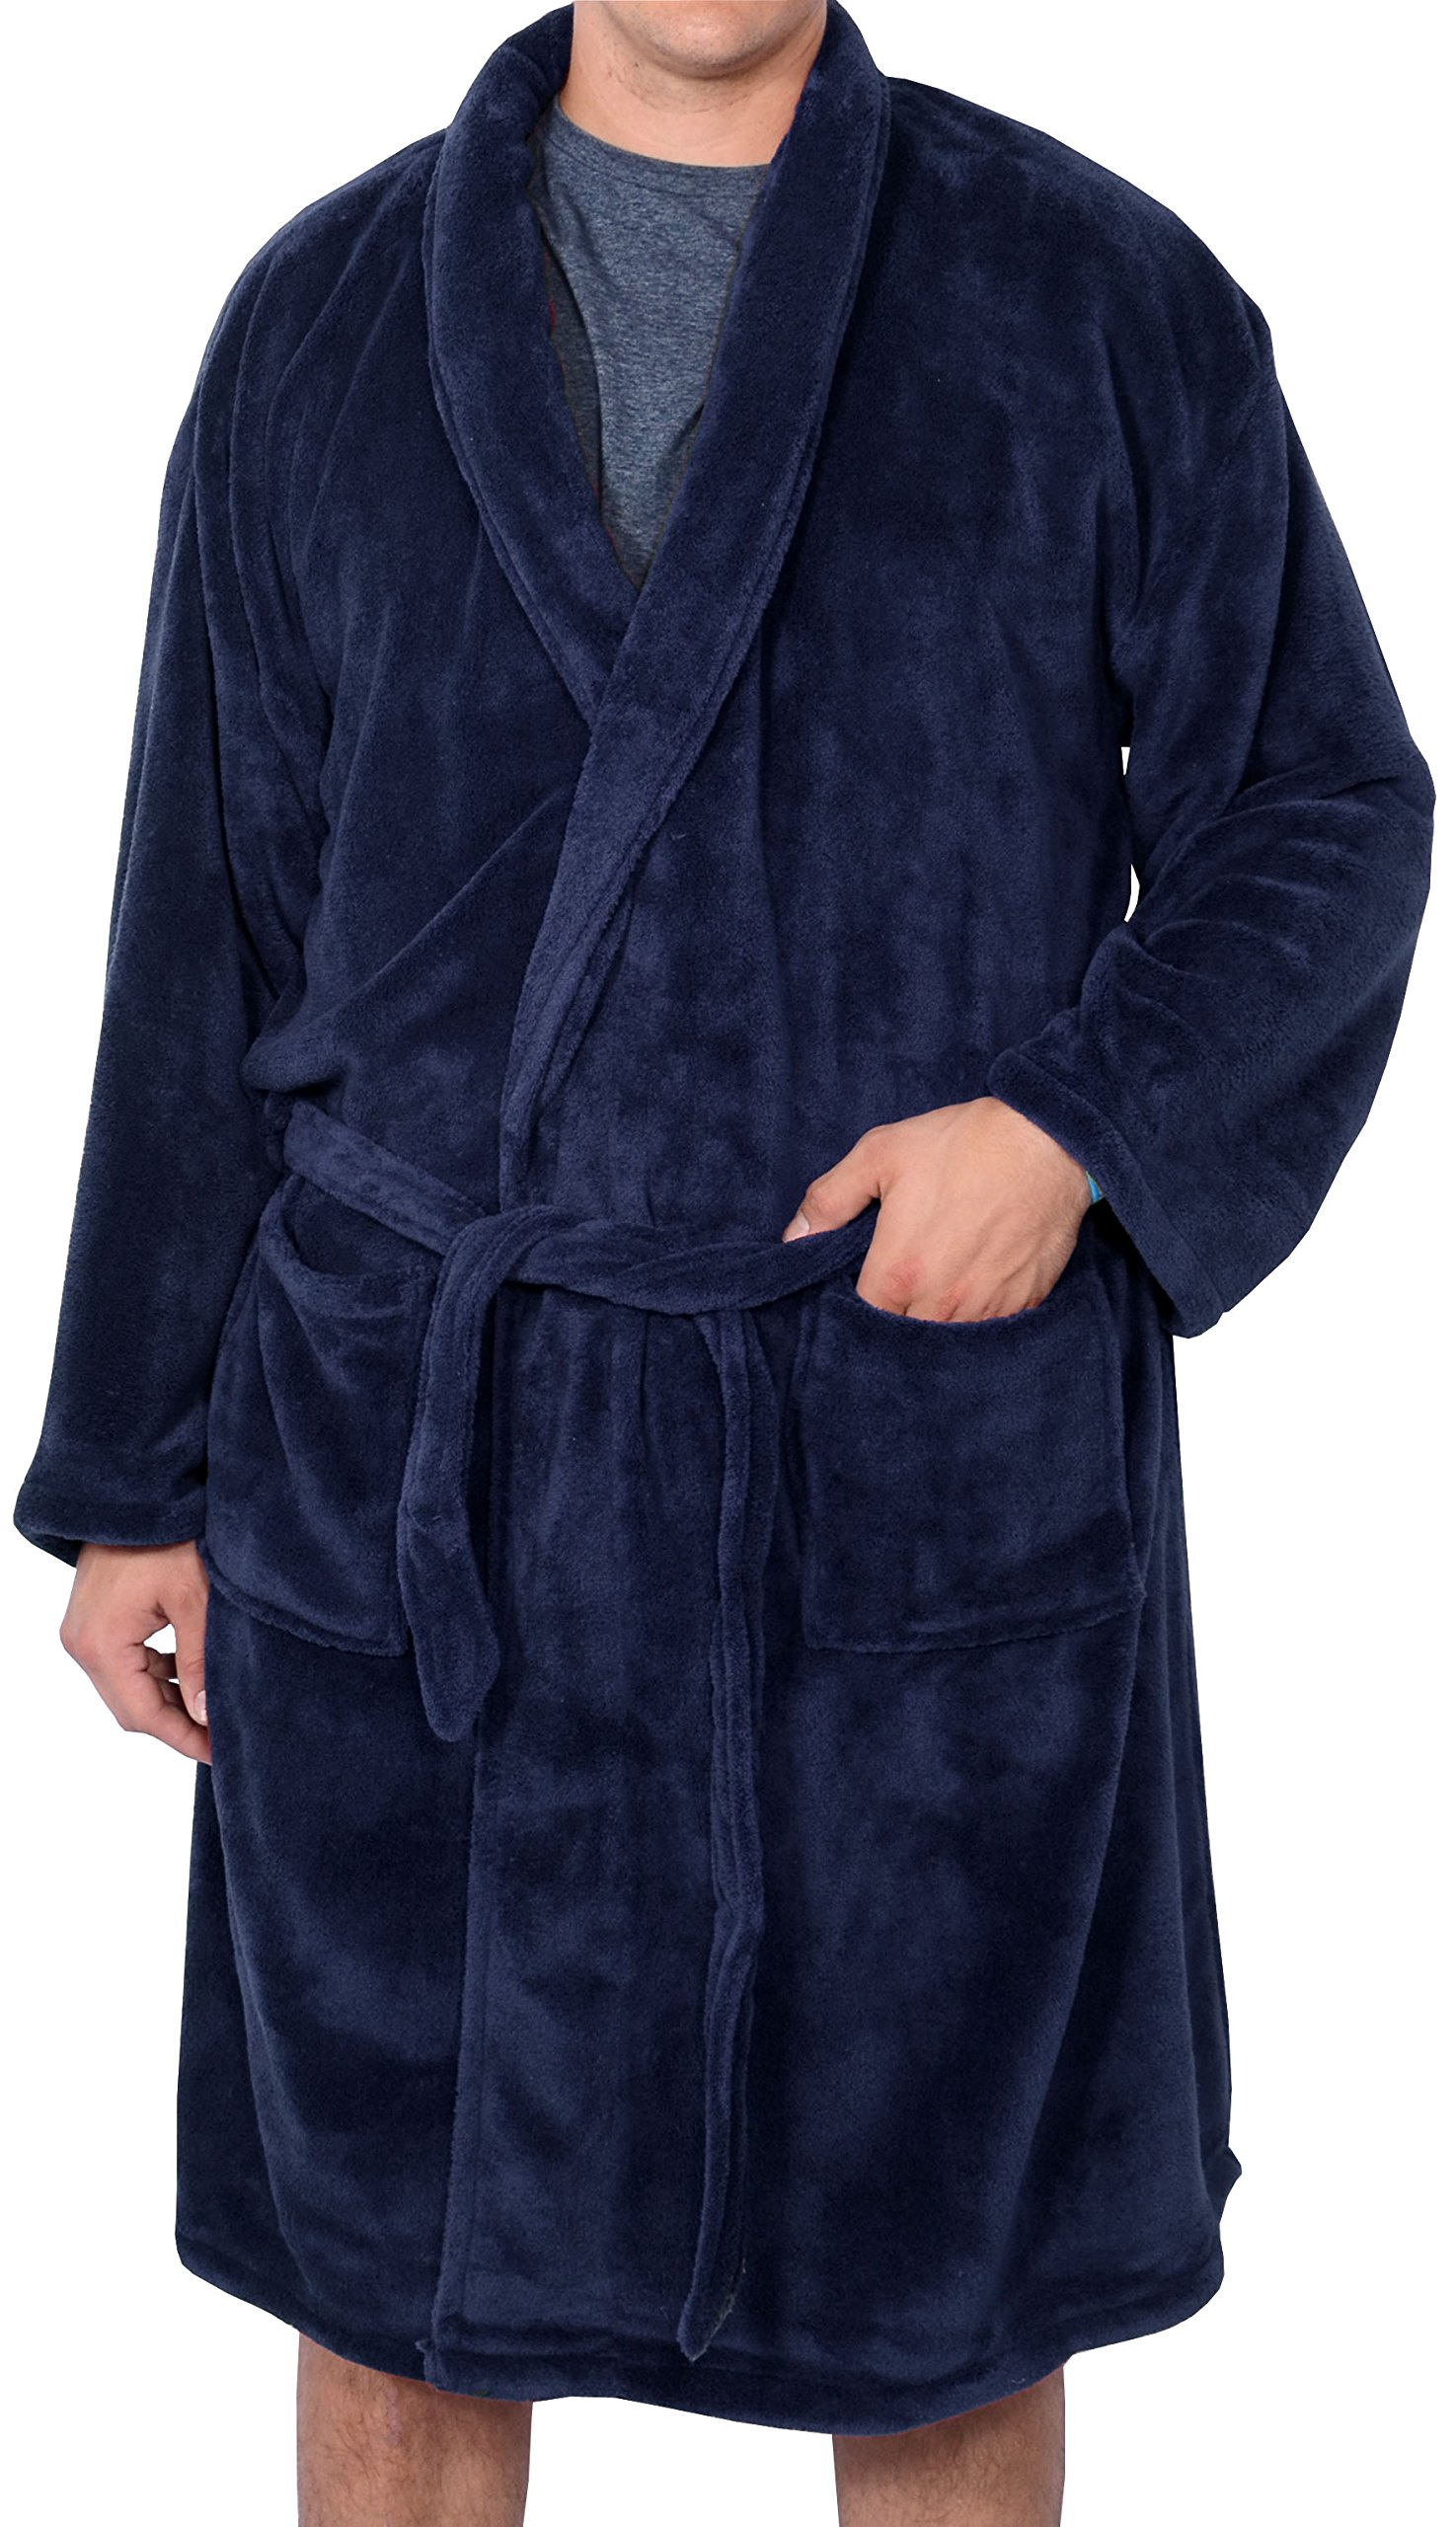 Foxfire Big and Tall Men's Plush Robe 5XL - 6BlueXL Navy